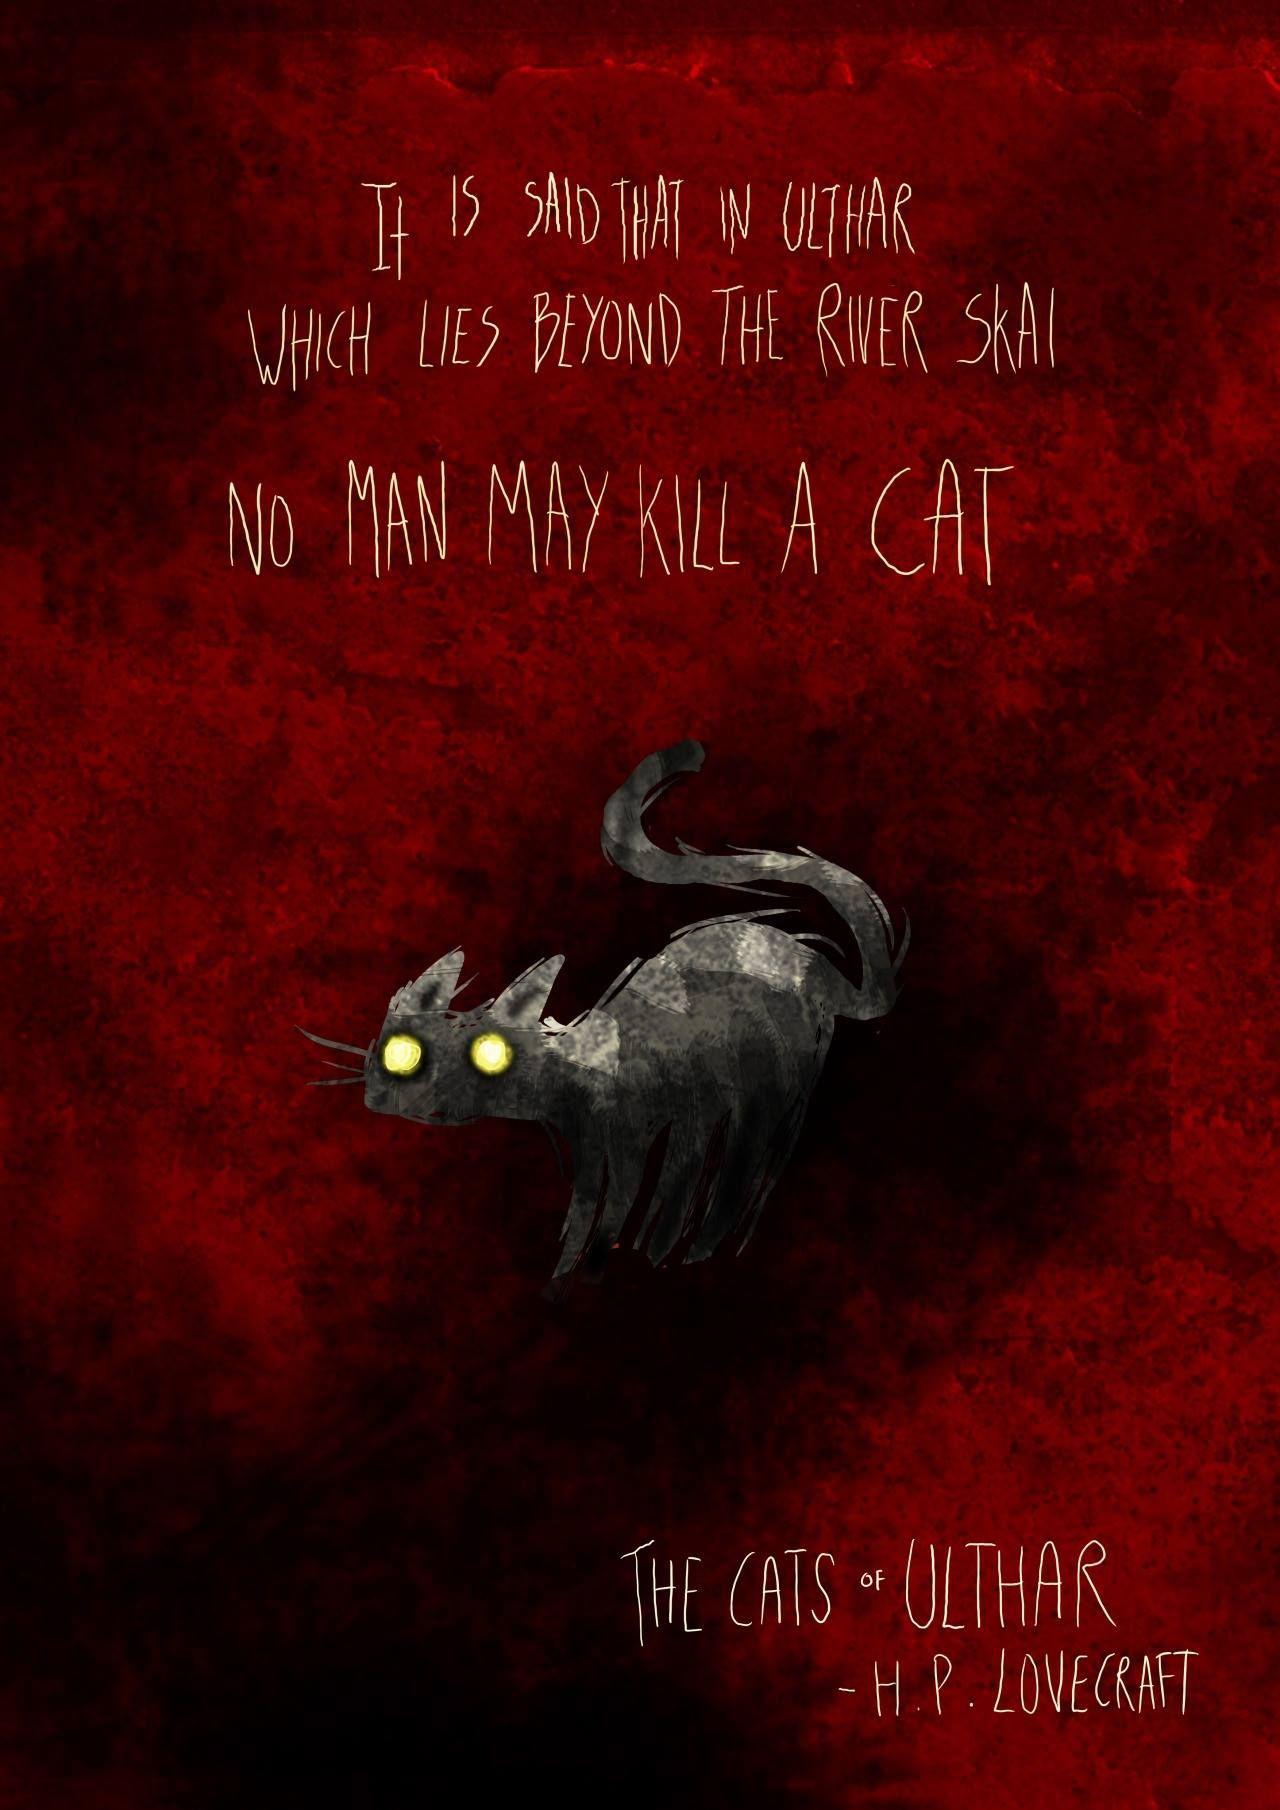 Cats Of Ulthar Lovecraft Cthulhu Cthulhu Mythos Lovecraftian Horror